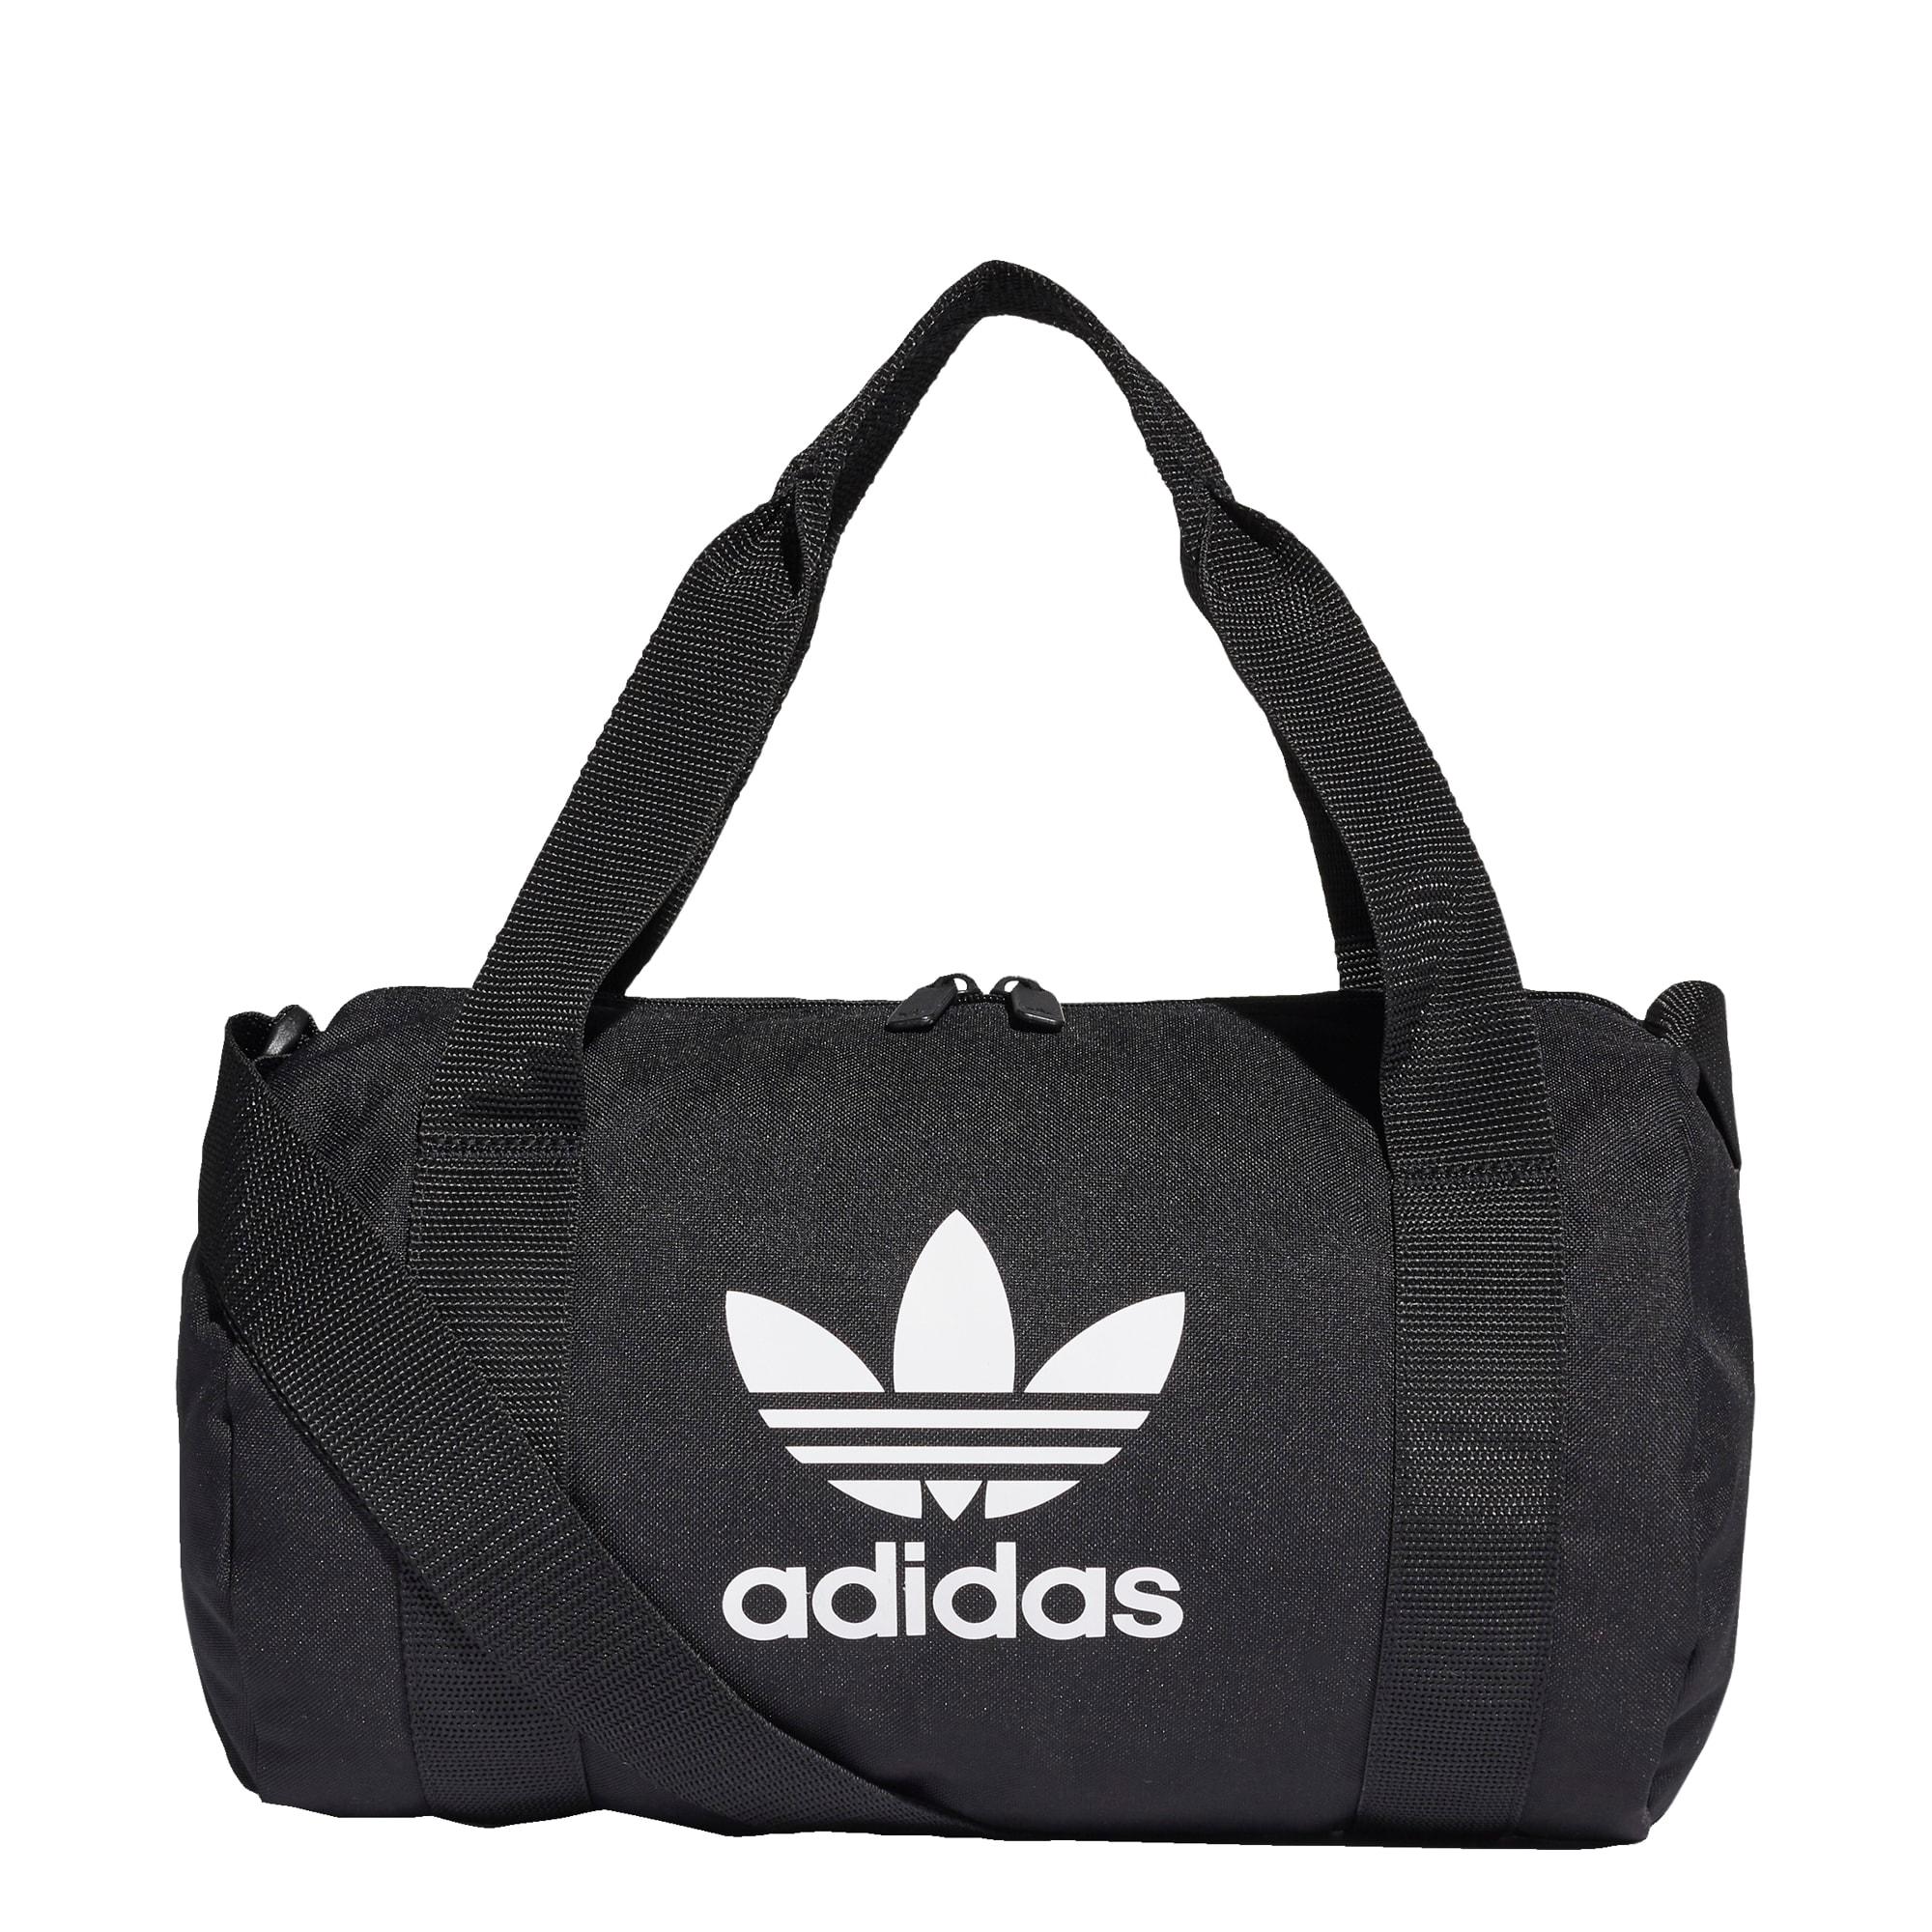 ADIDAS ORIGINALS Kelioninis krepšys juoda / balta